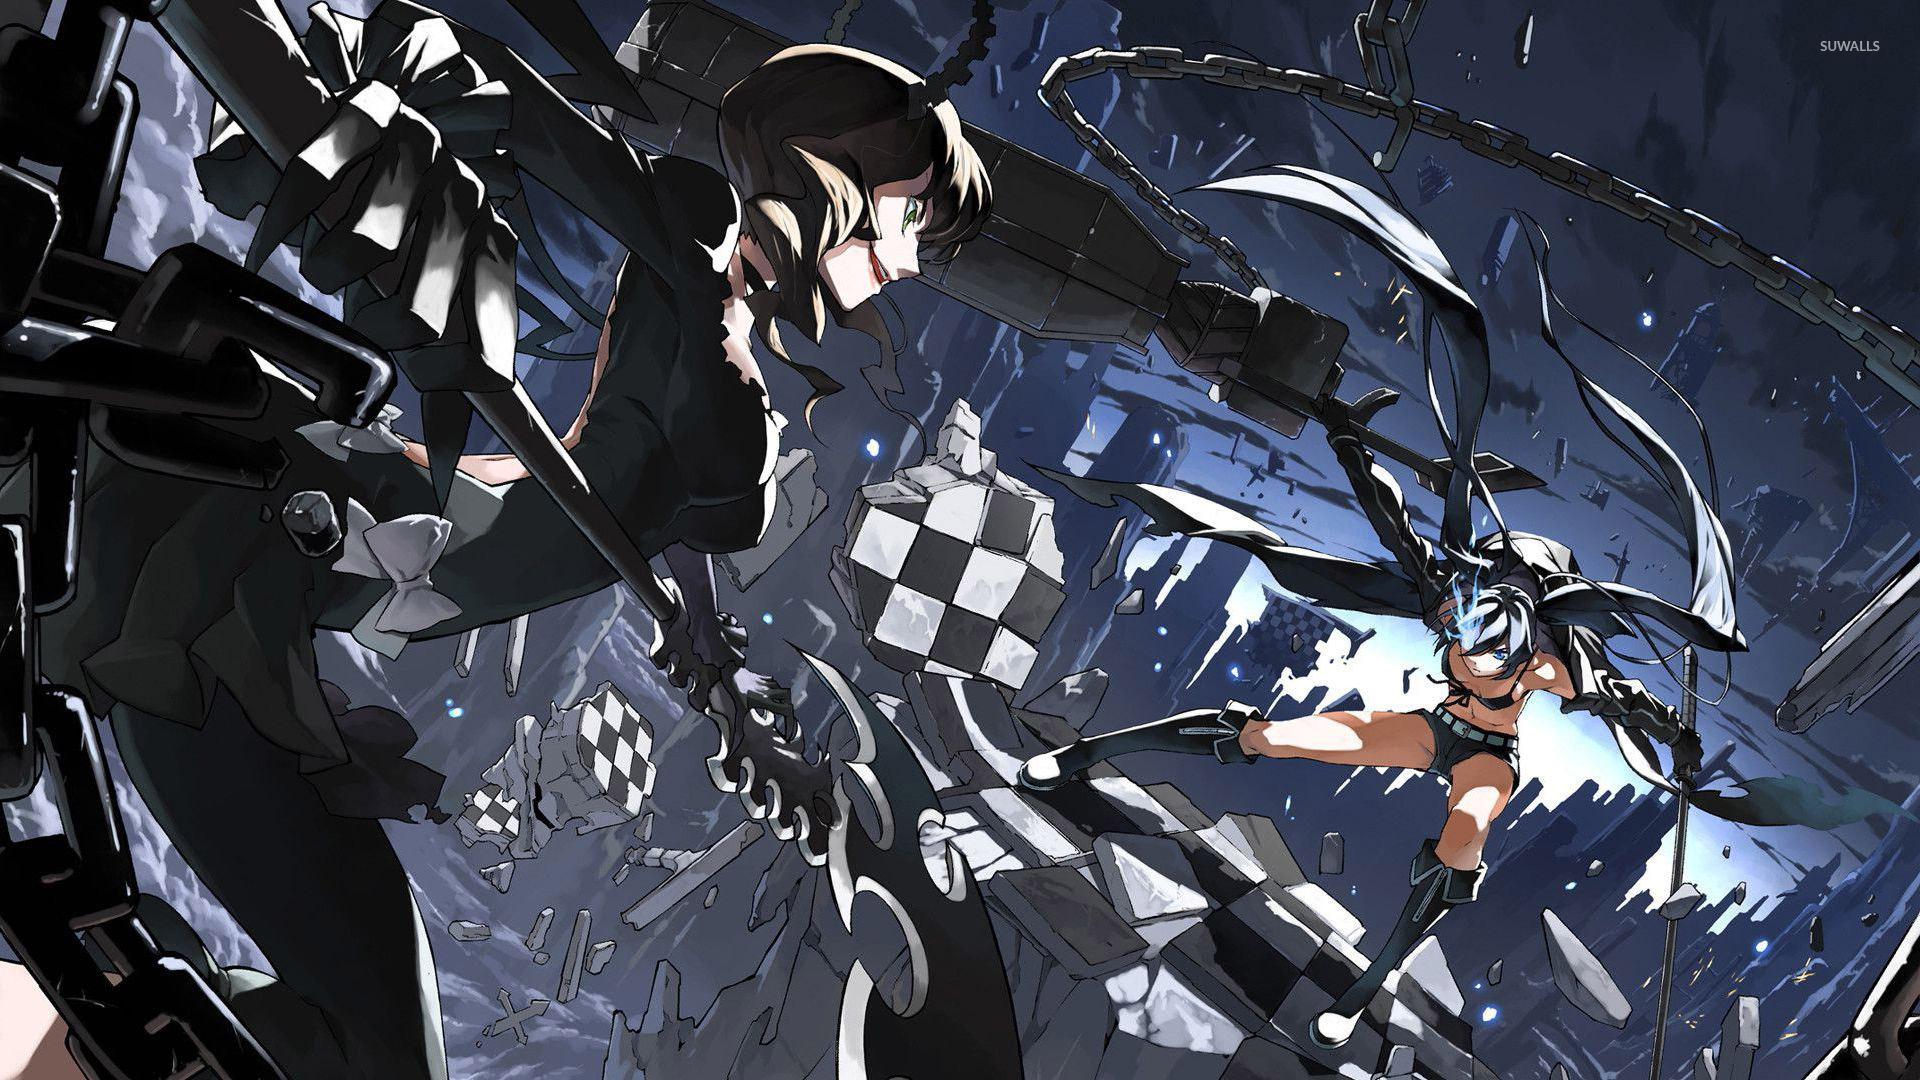 Top Quotes Wallpaper Black Rock Shooter 21 Wallpaper Anime Wallpapers 26560